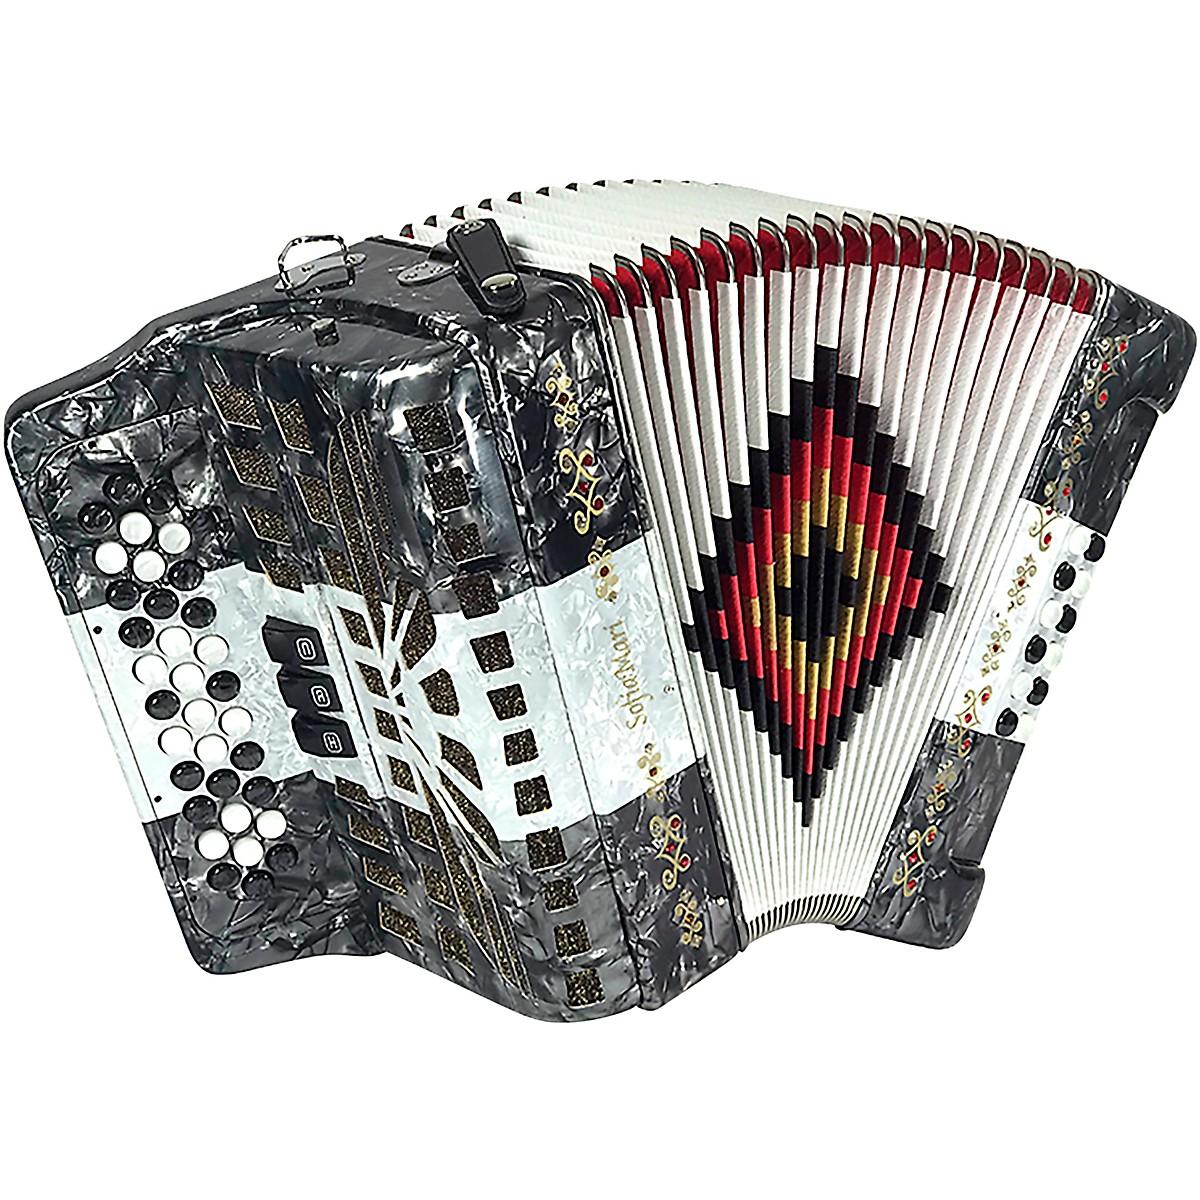 SofiaMari SM-3412 34-Button 12 Bass Accordion FBE